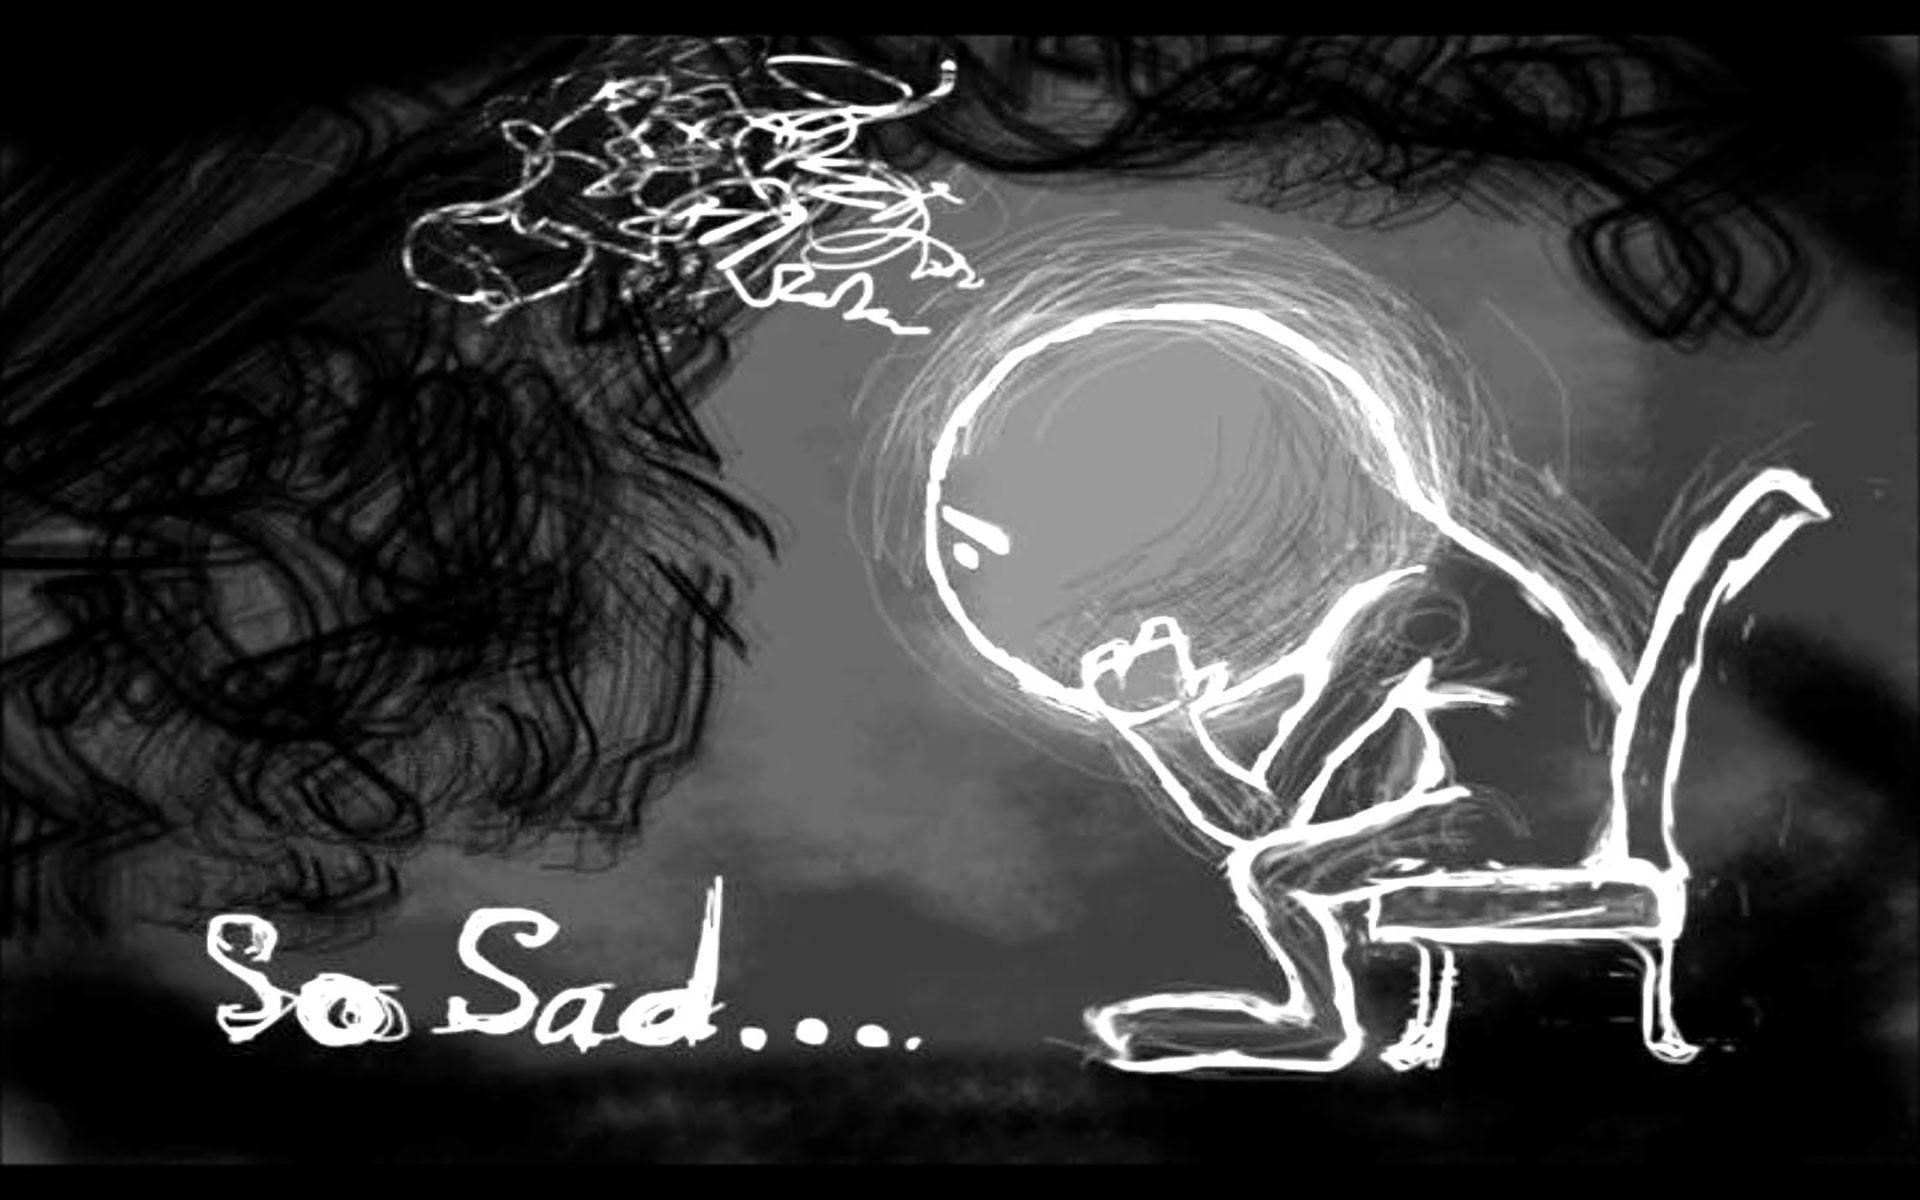 Depressed Wallpaper Desktop #h781501456, 207.71 Kb